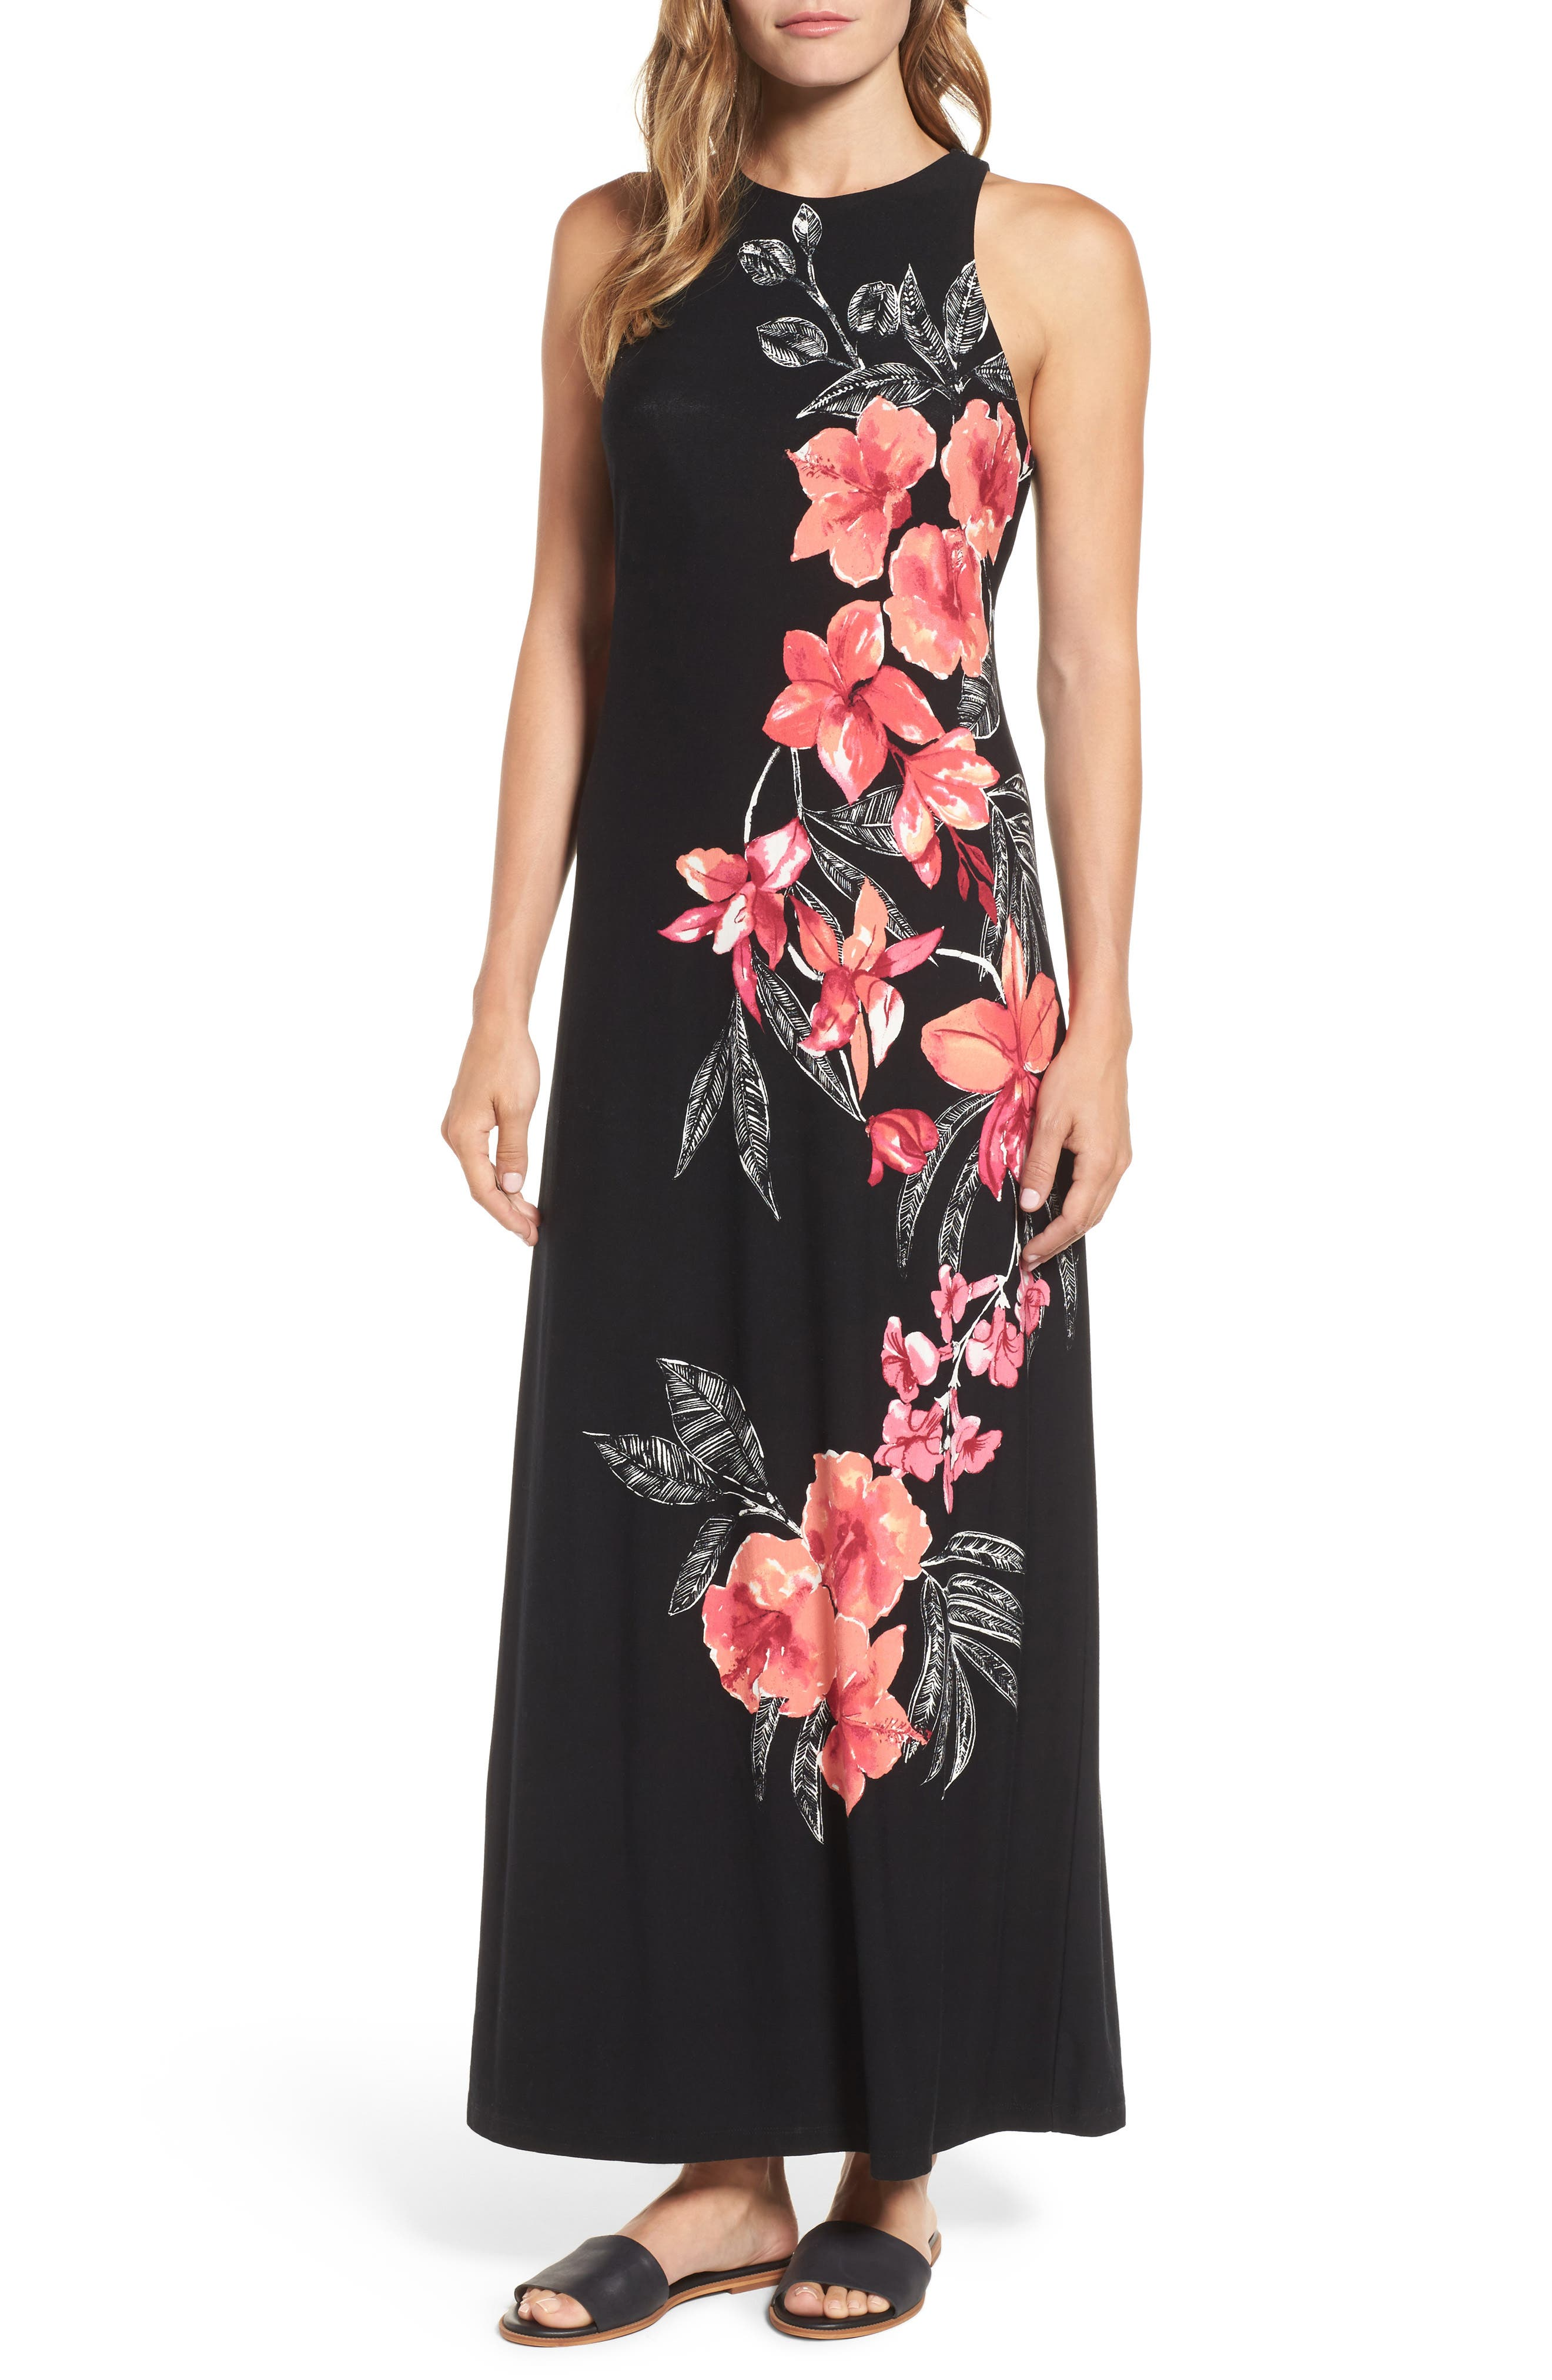 Bedoin Blossoms Maxi Dress,                             Main thumbnail 1, color,                             001